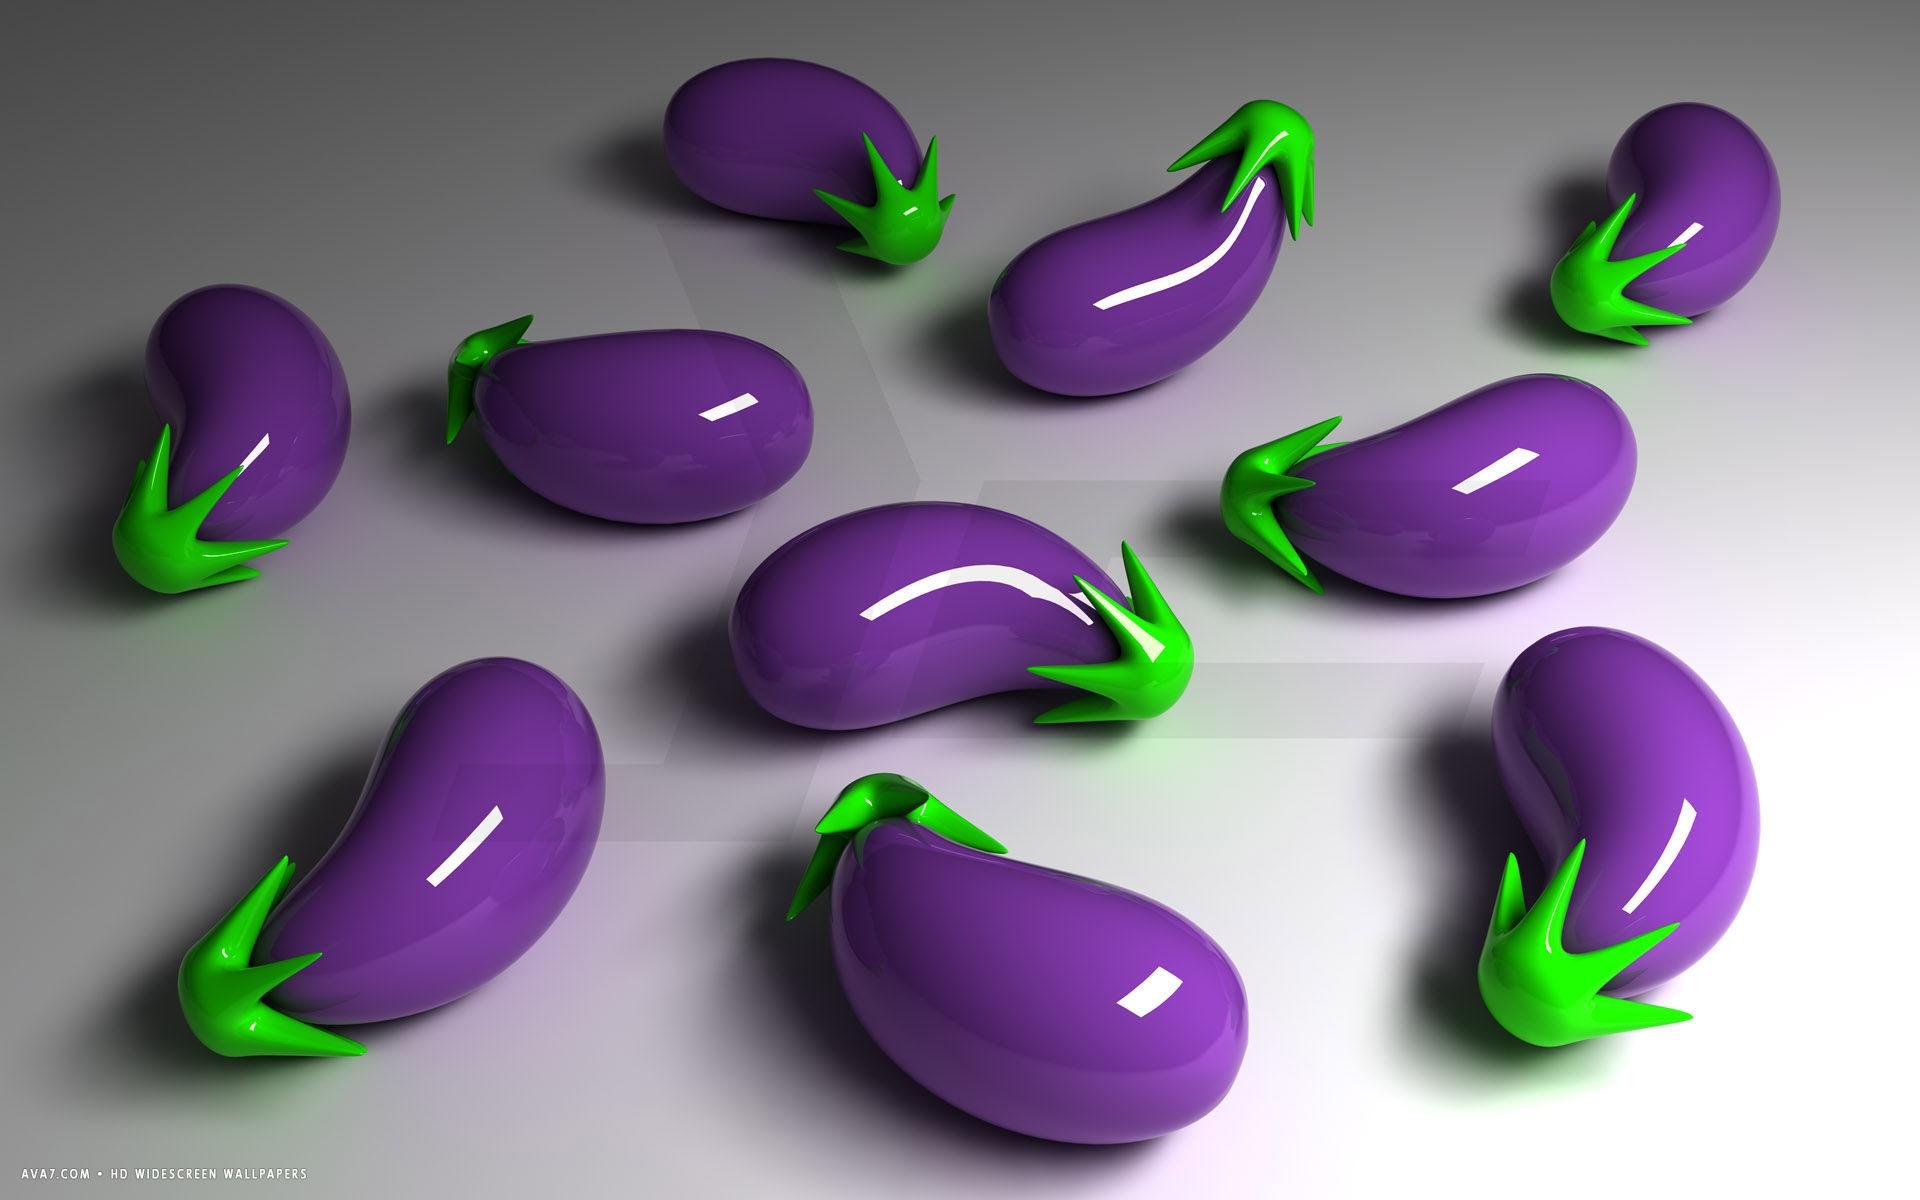 3d flames abstract grid cage window fire; 3d eggplant desktop art shiny  purple vegetable